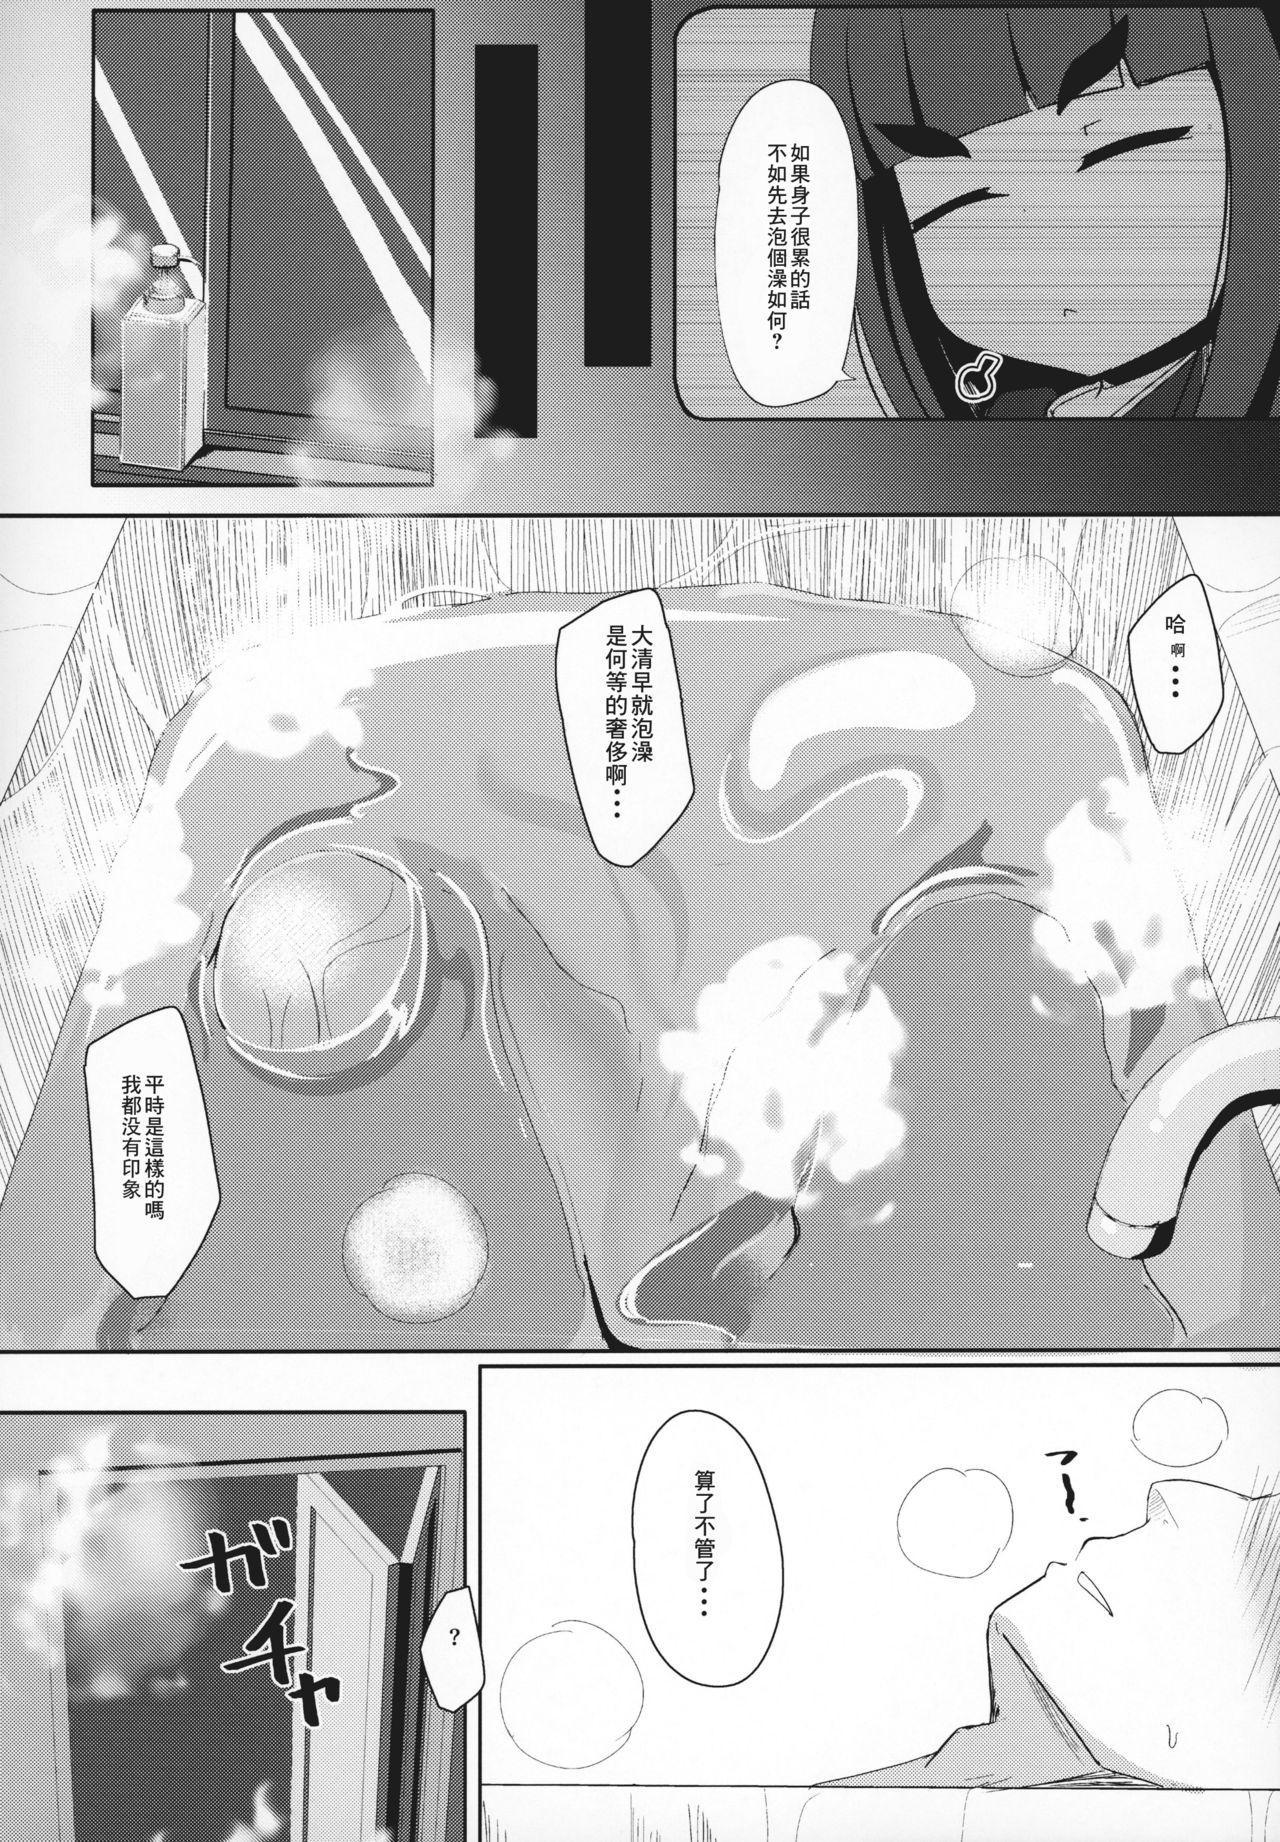 (COMITIA127) [Manpuchi (Nekodel)] Uro -Makuai- Kanwa [Chinese] [零食汉化组] 12